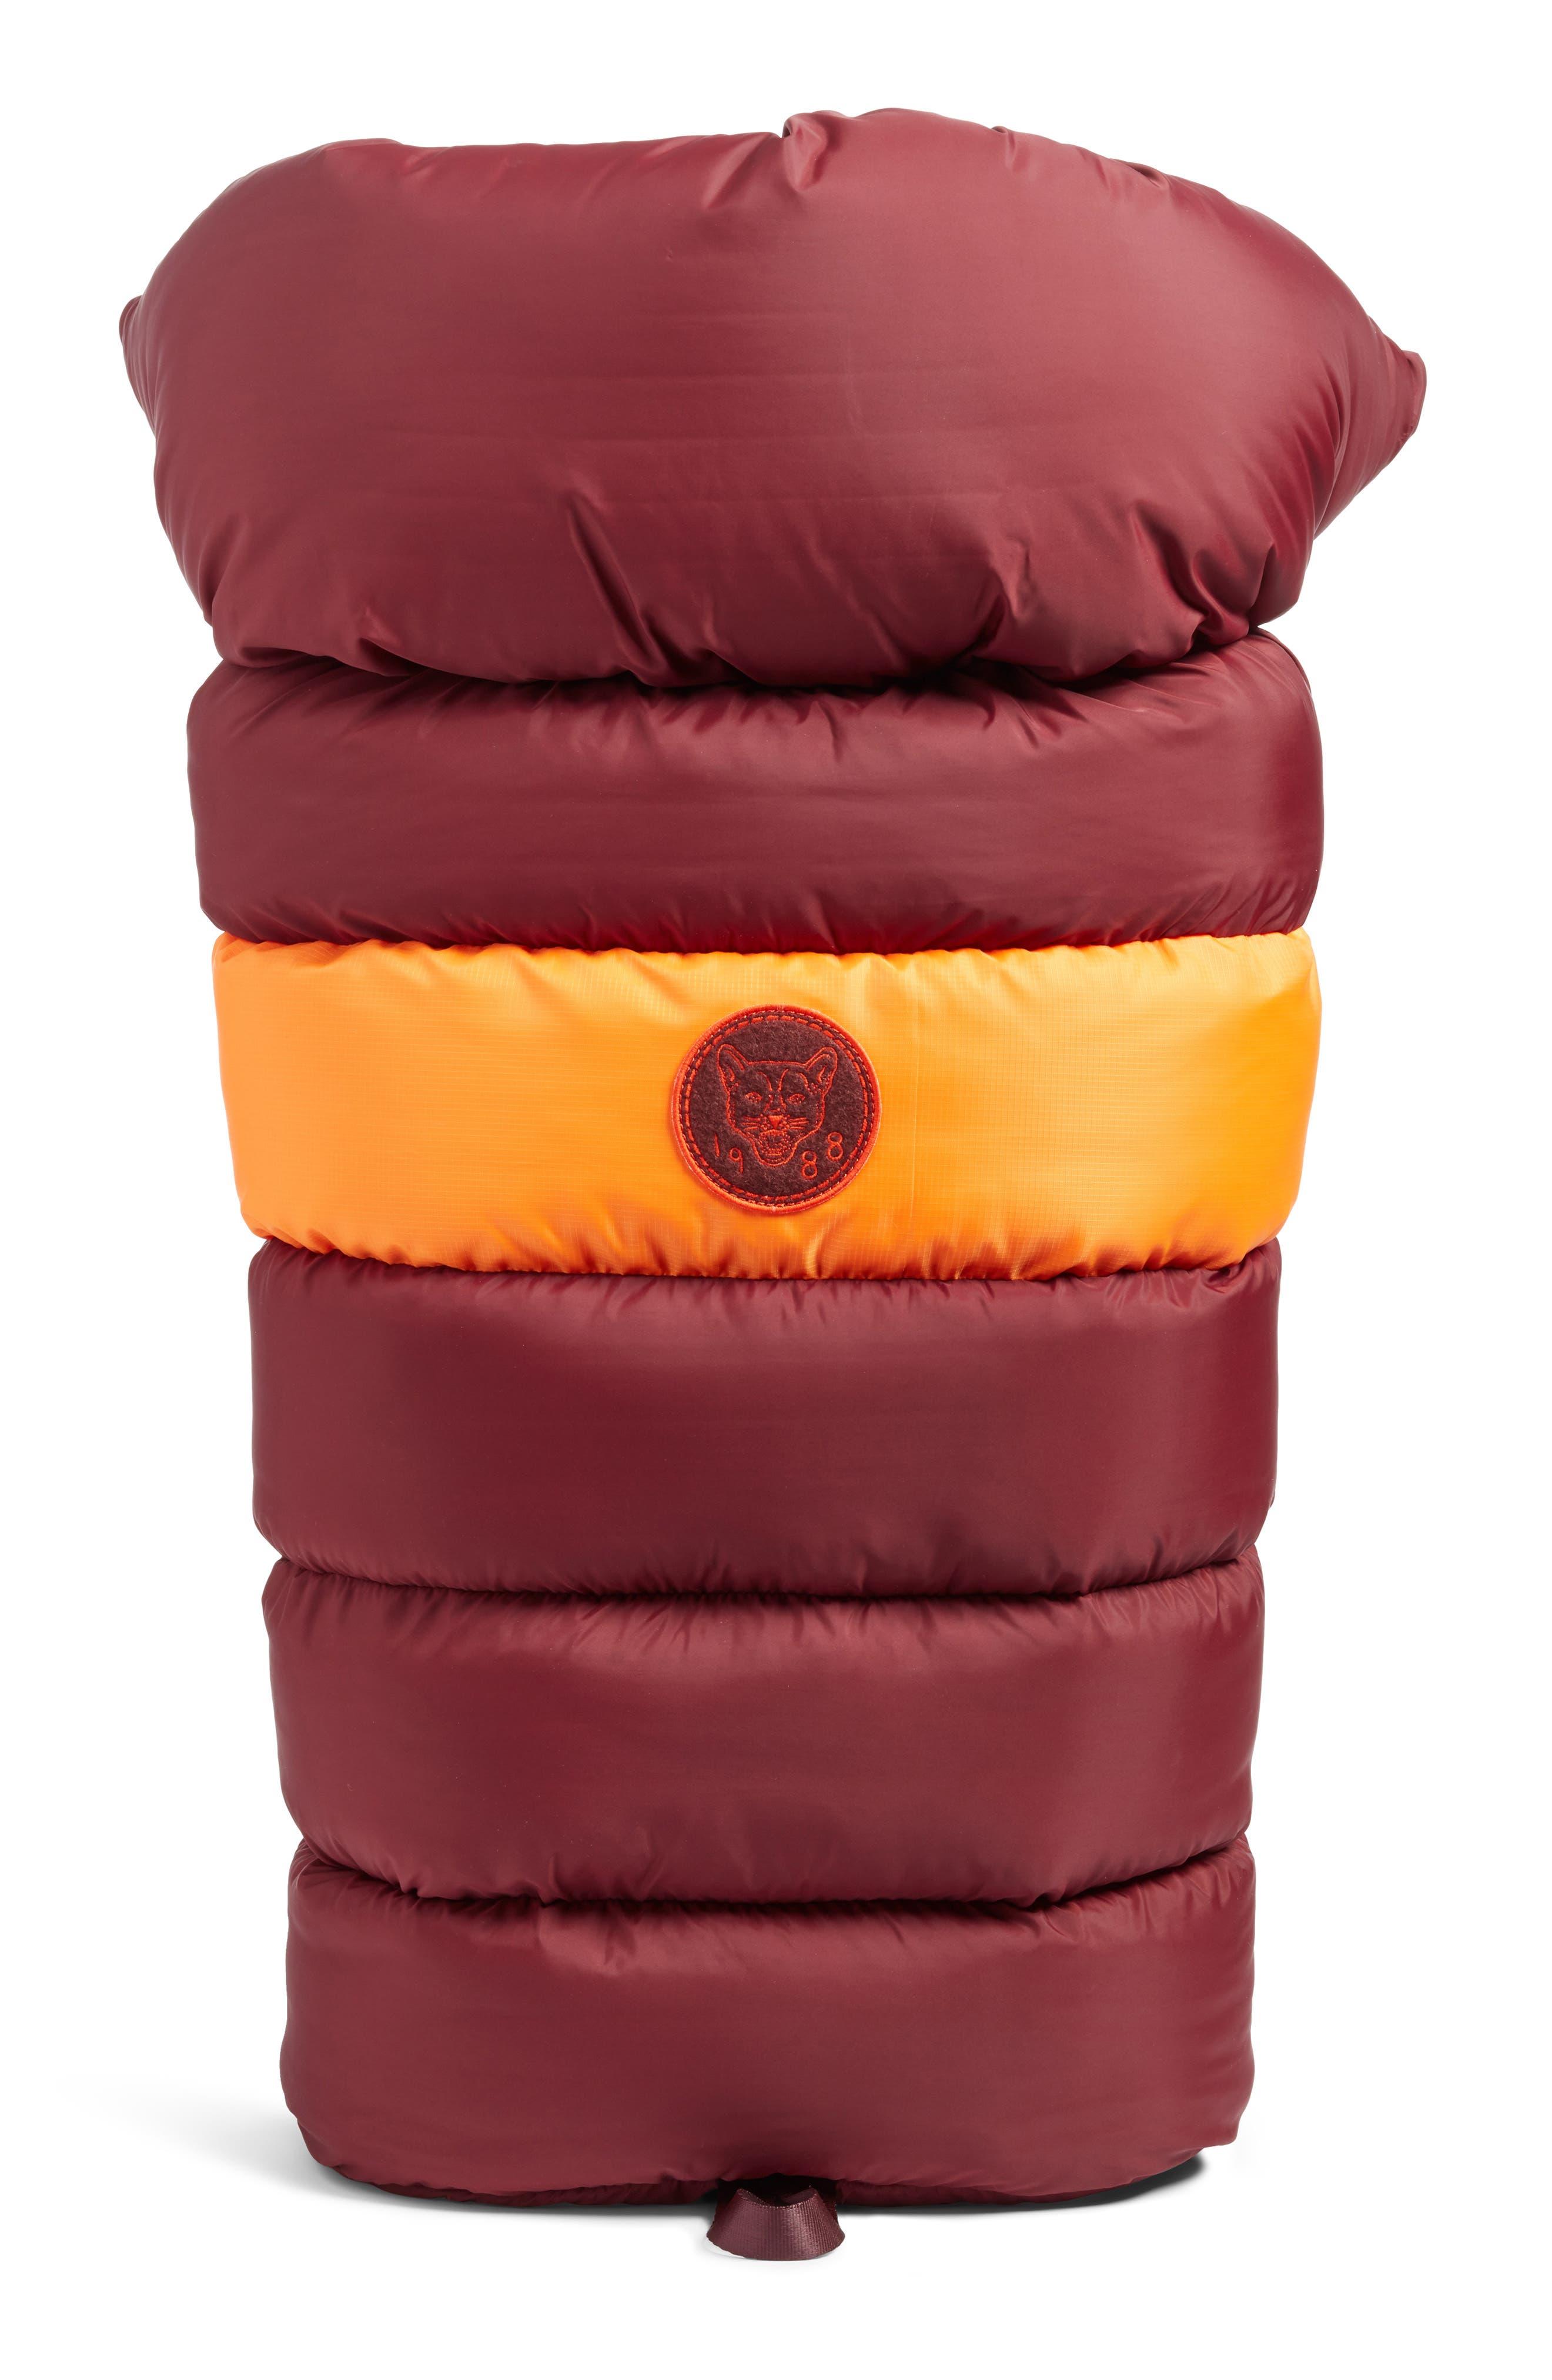 PUMA by Rihanna Backpack,                         Main,                         color, Burgundy Orange